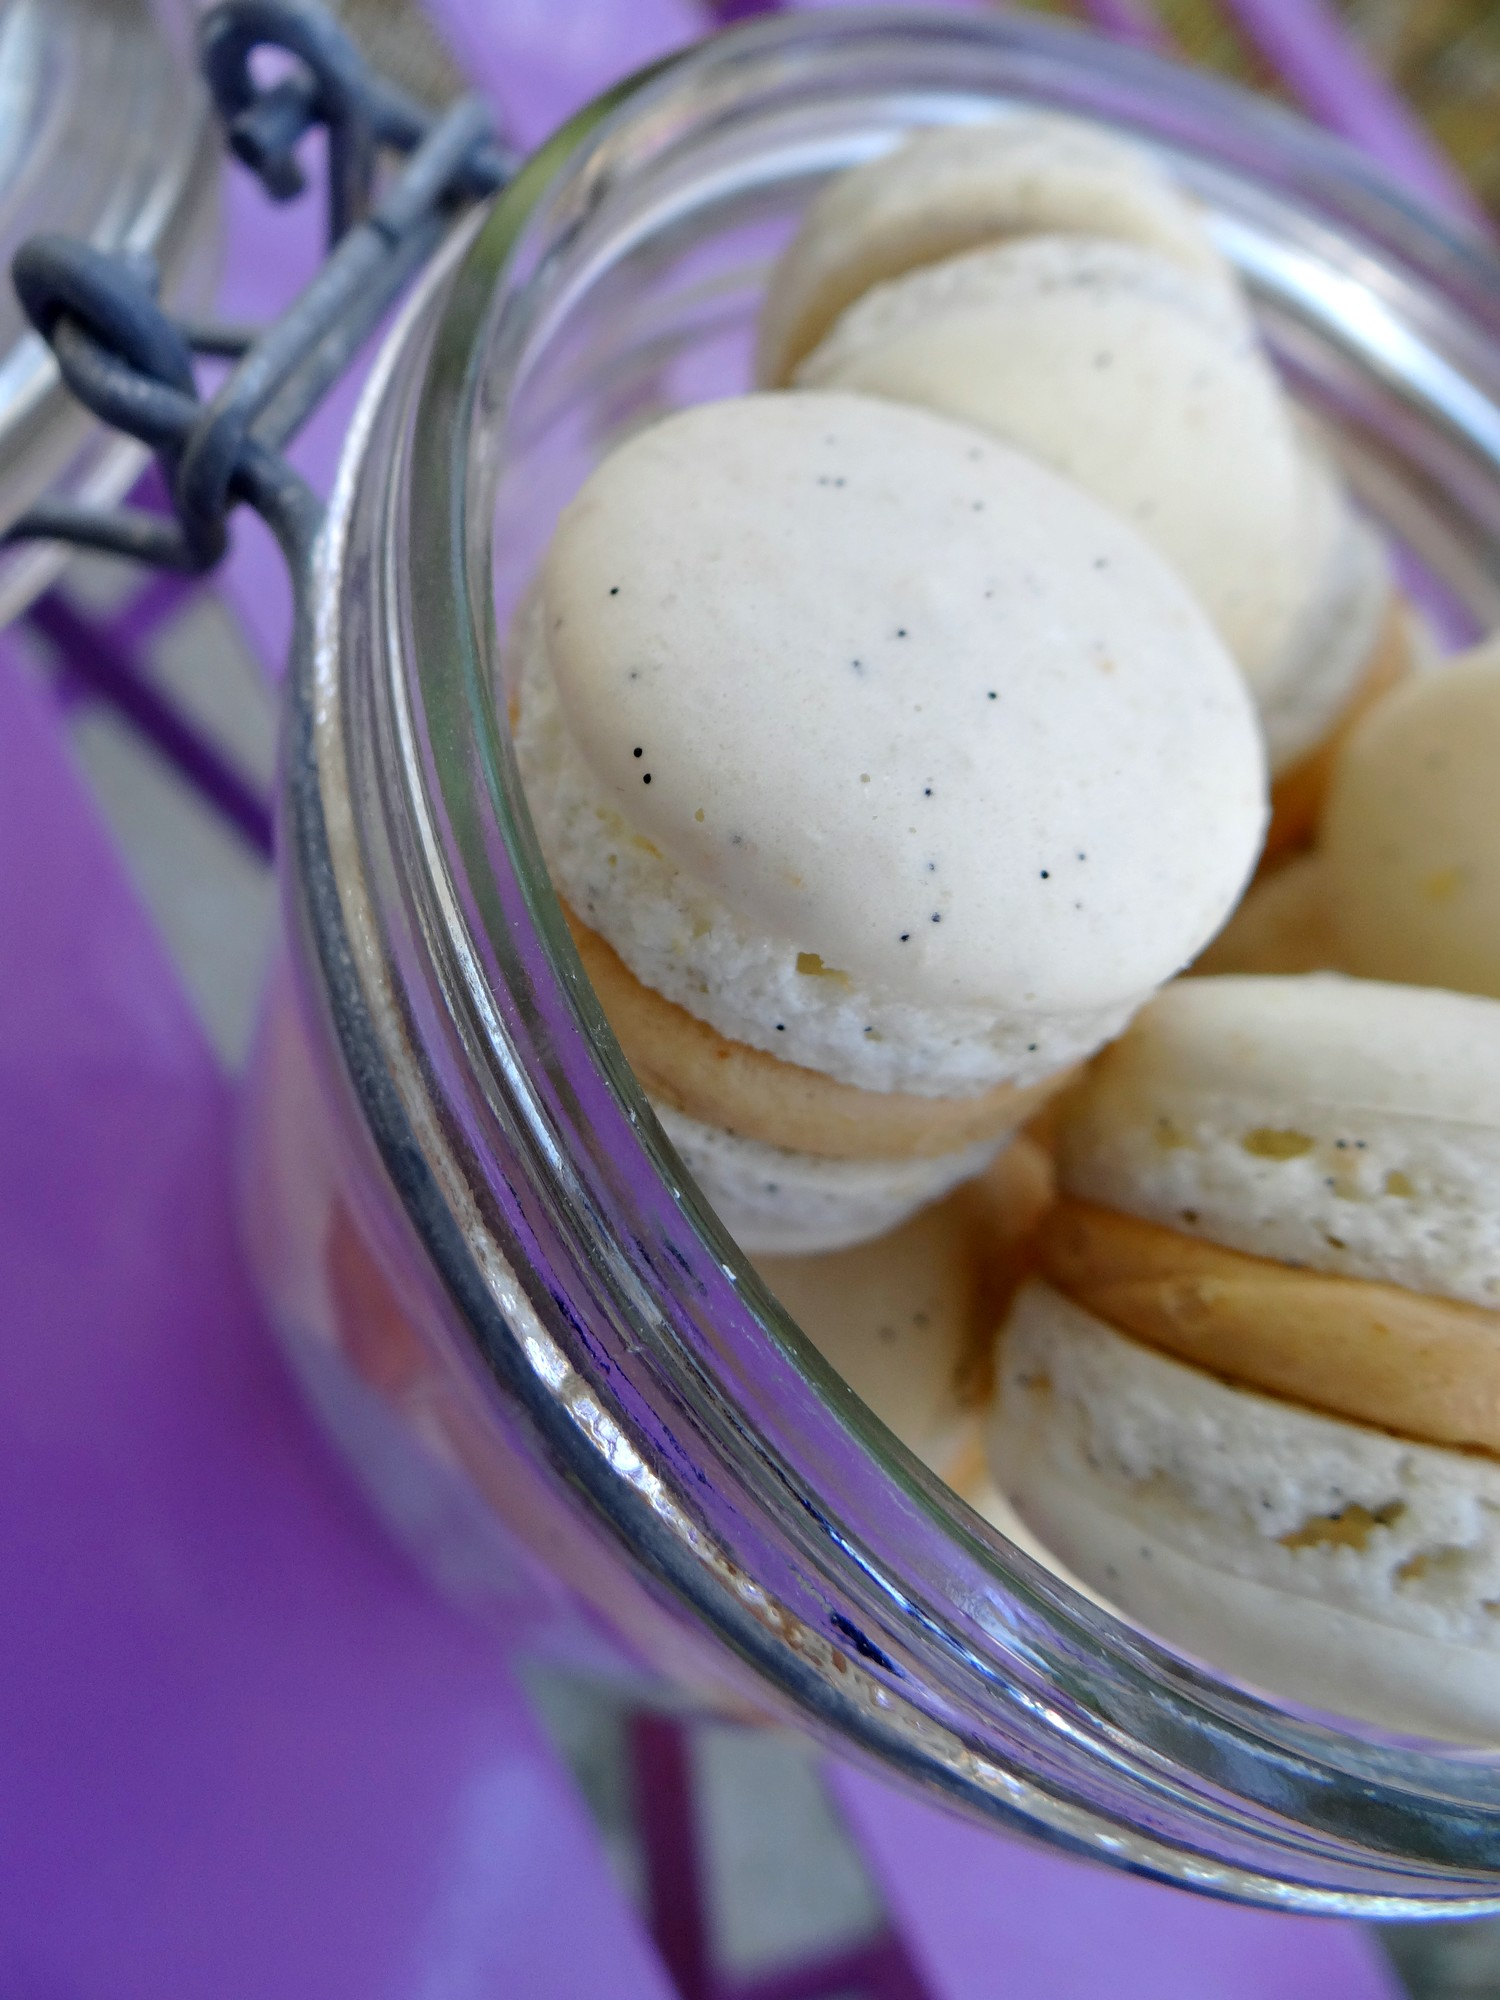 Mini-macarons tout doux vanille et caramel salé2